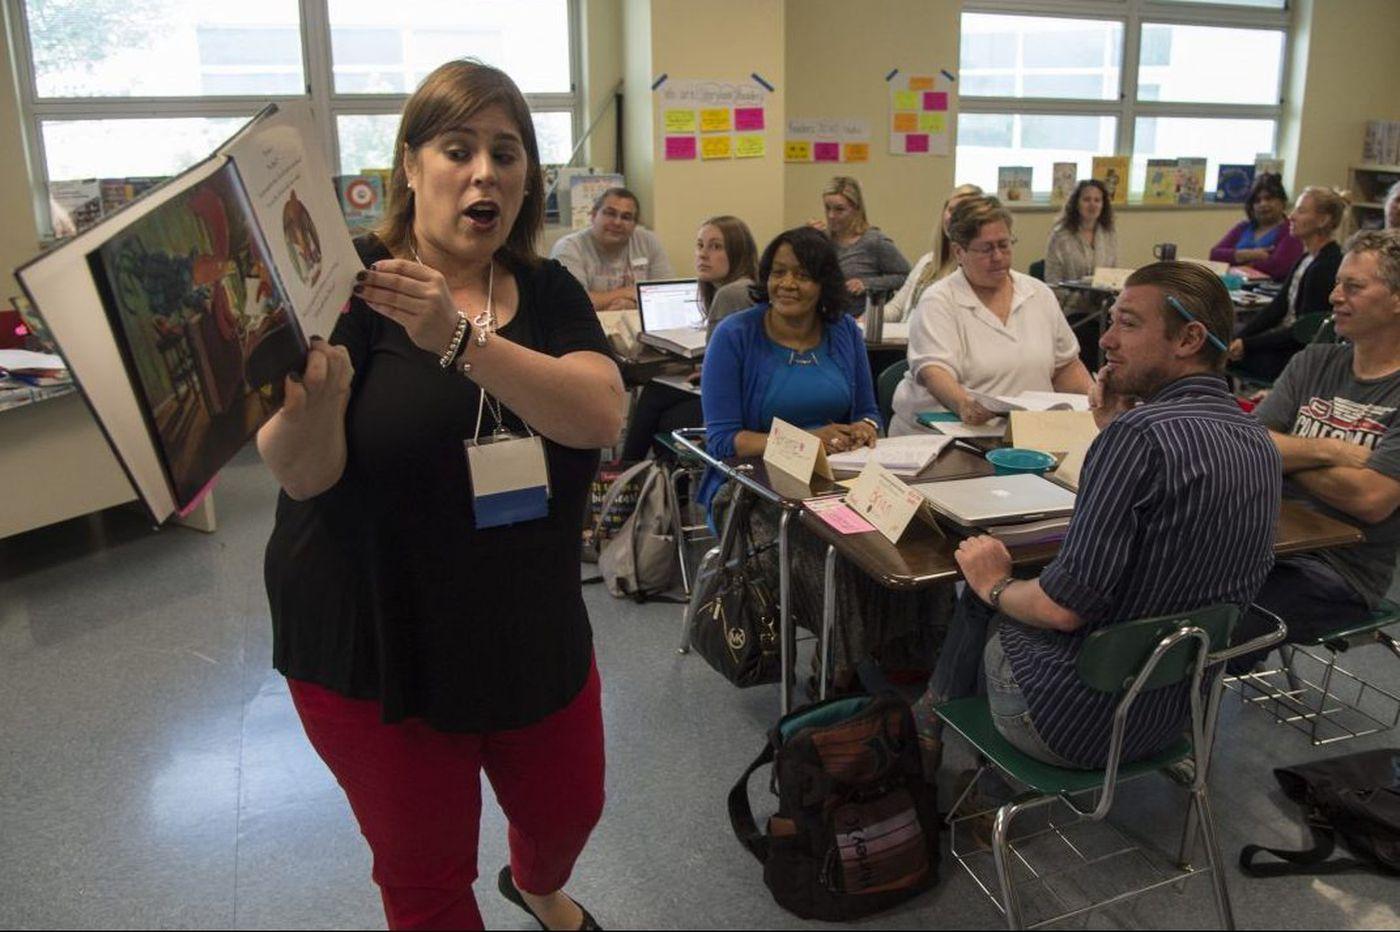 At summer school, teachers learn best methods to increase literacy